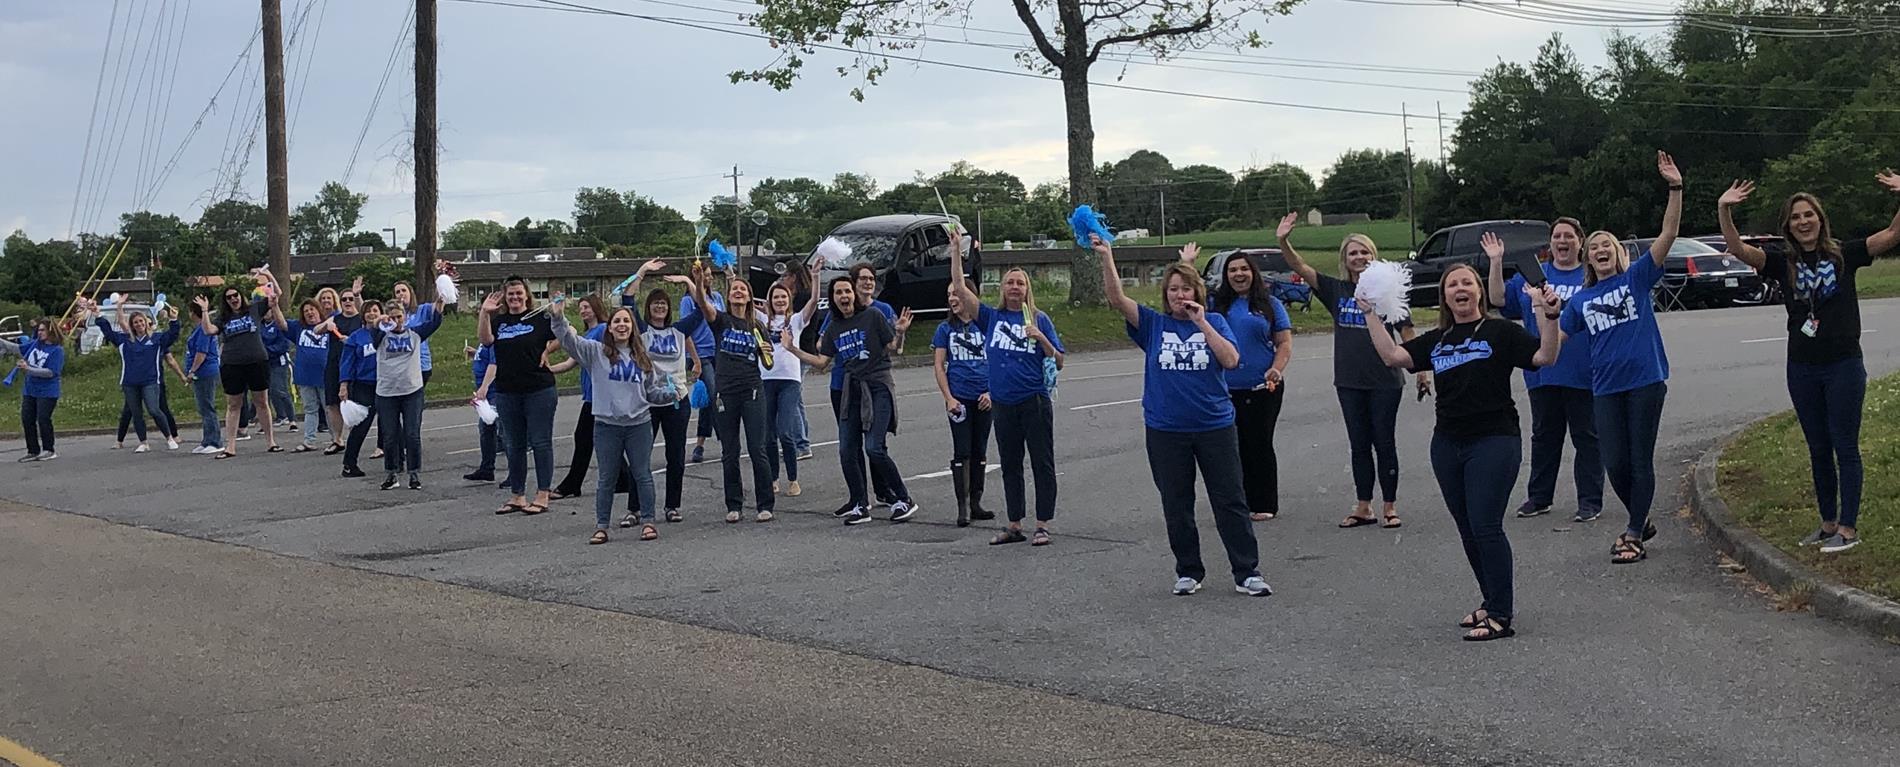 teachers in parade